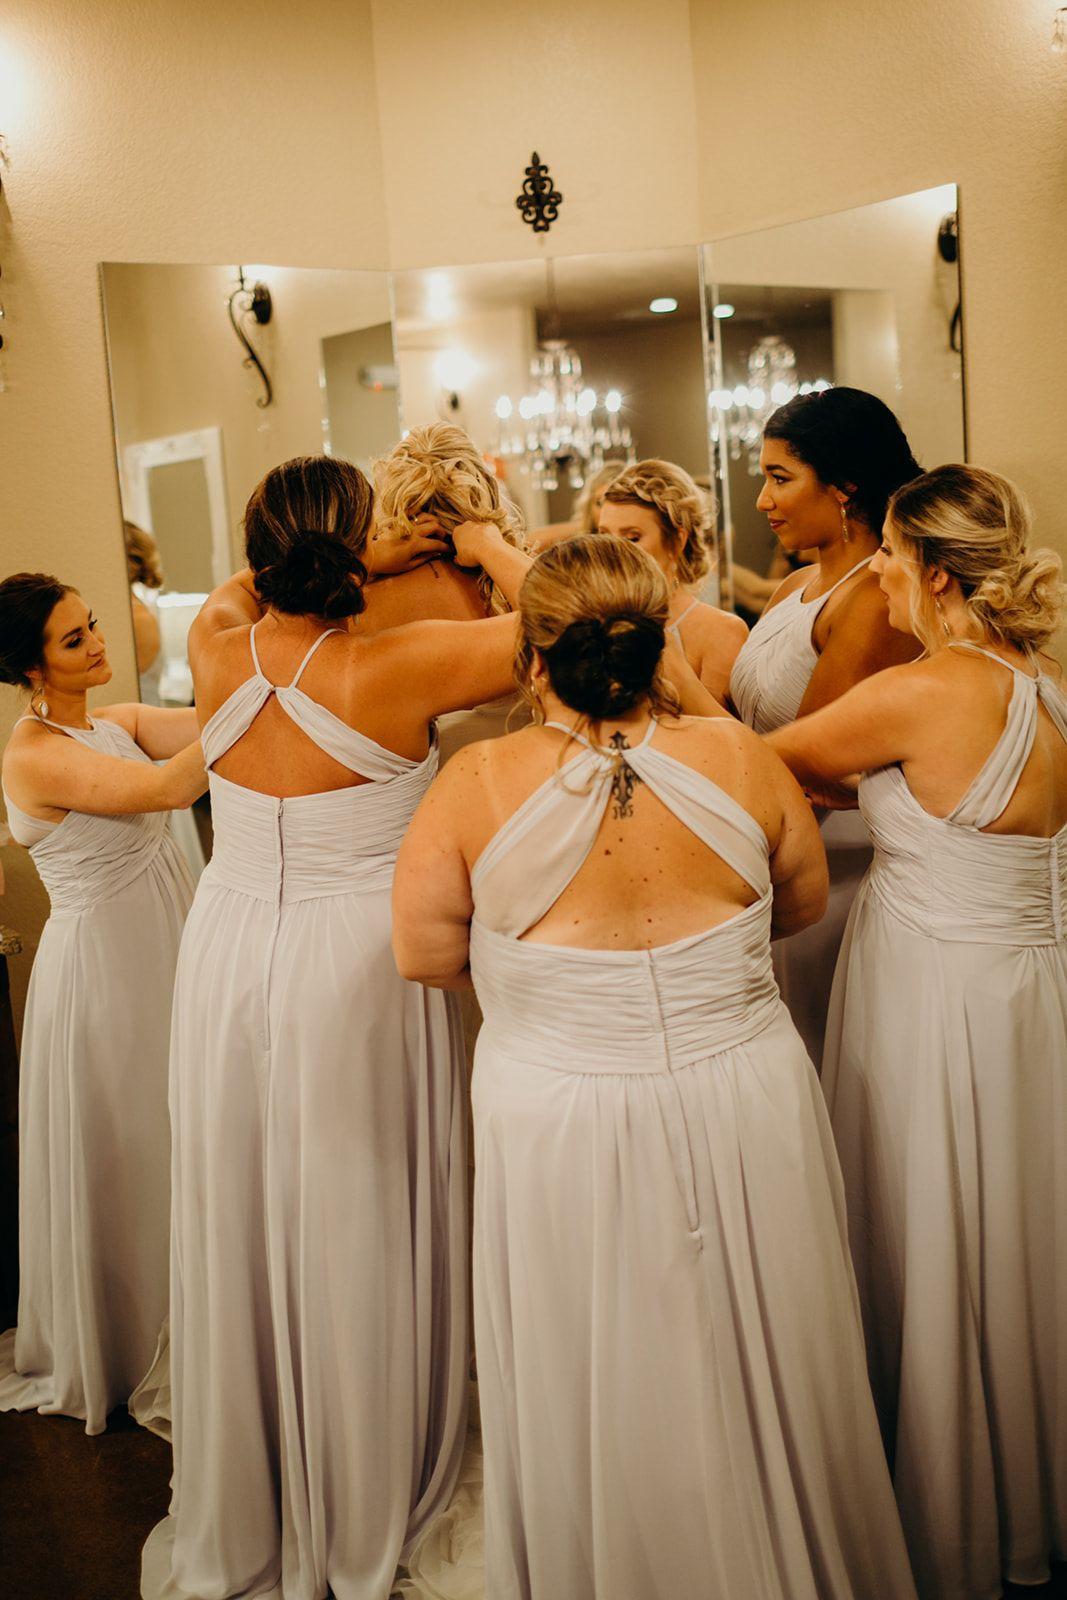 Wedding dresses tulsa  candid bridesmaid photo  bridesmaids helping the bride get her